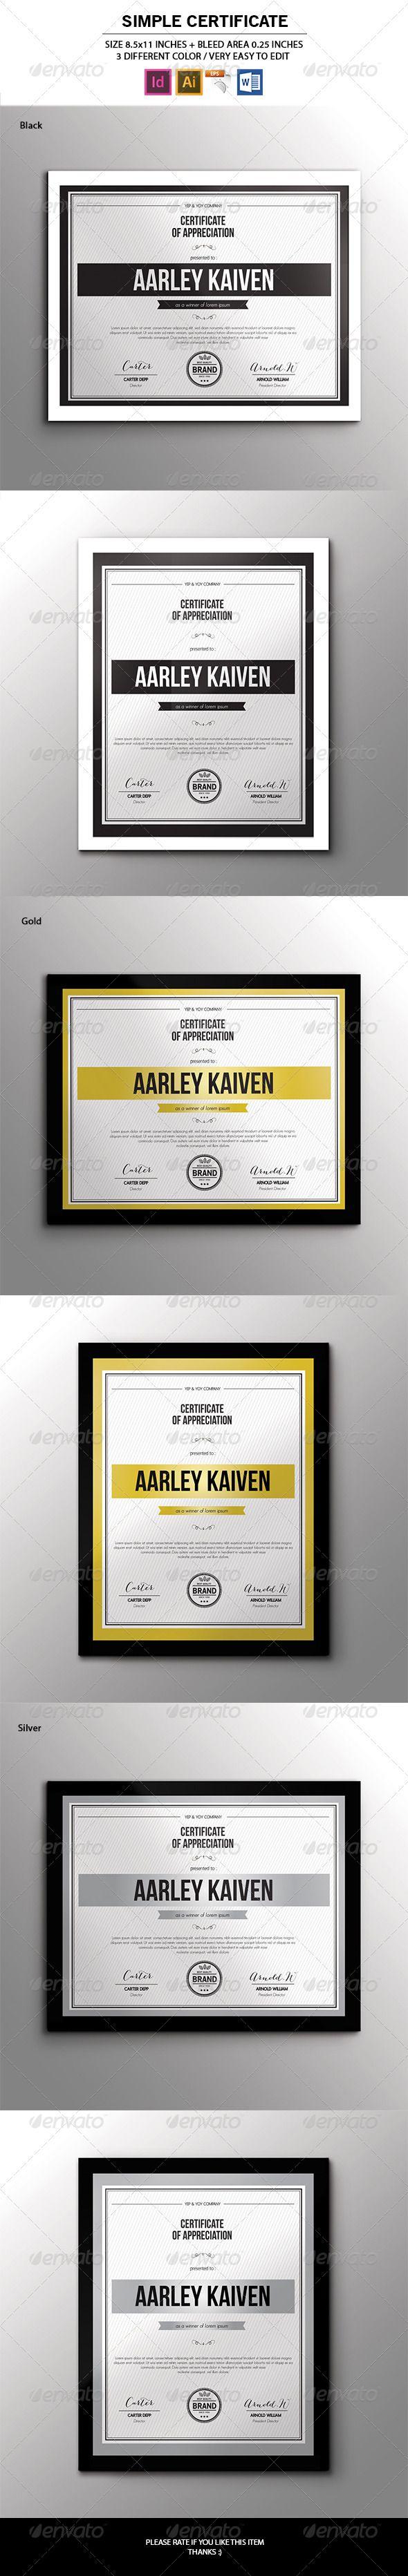 Simple Multipurpose Certificates - Certificates Stationery « GraphicRiver.com